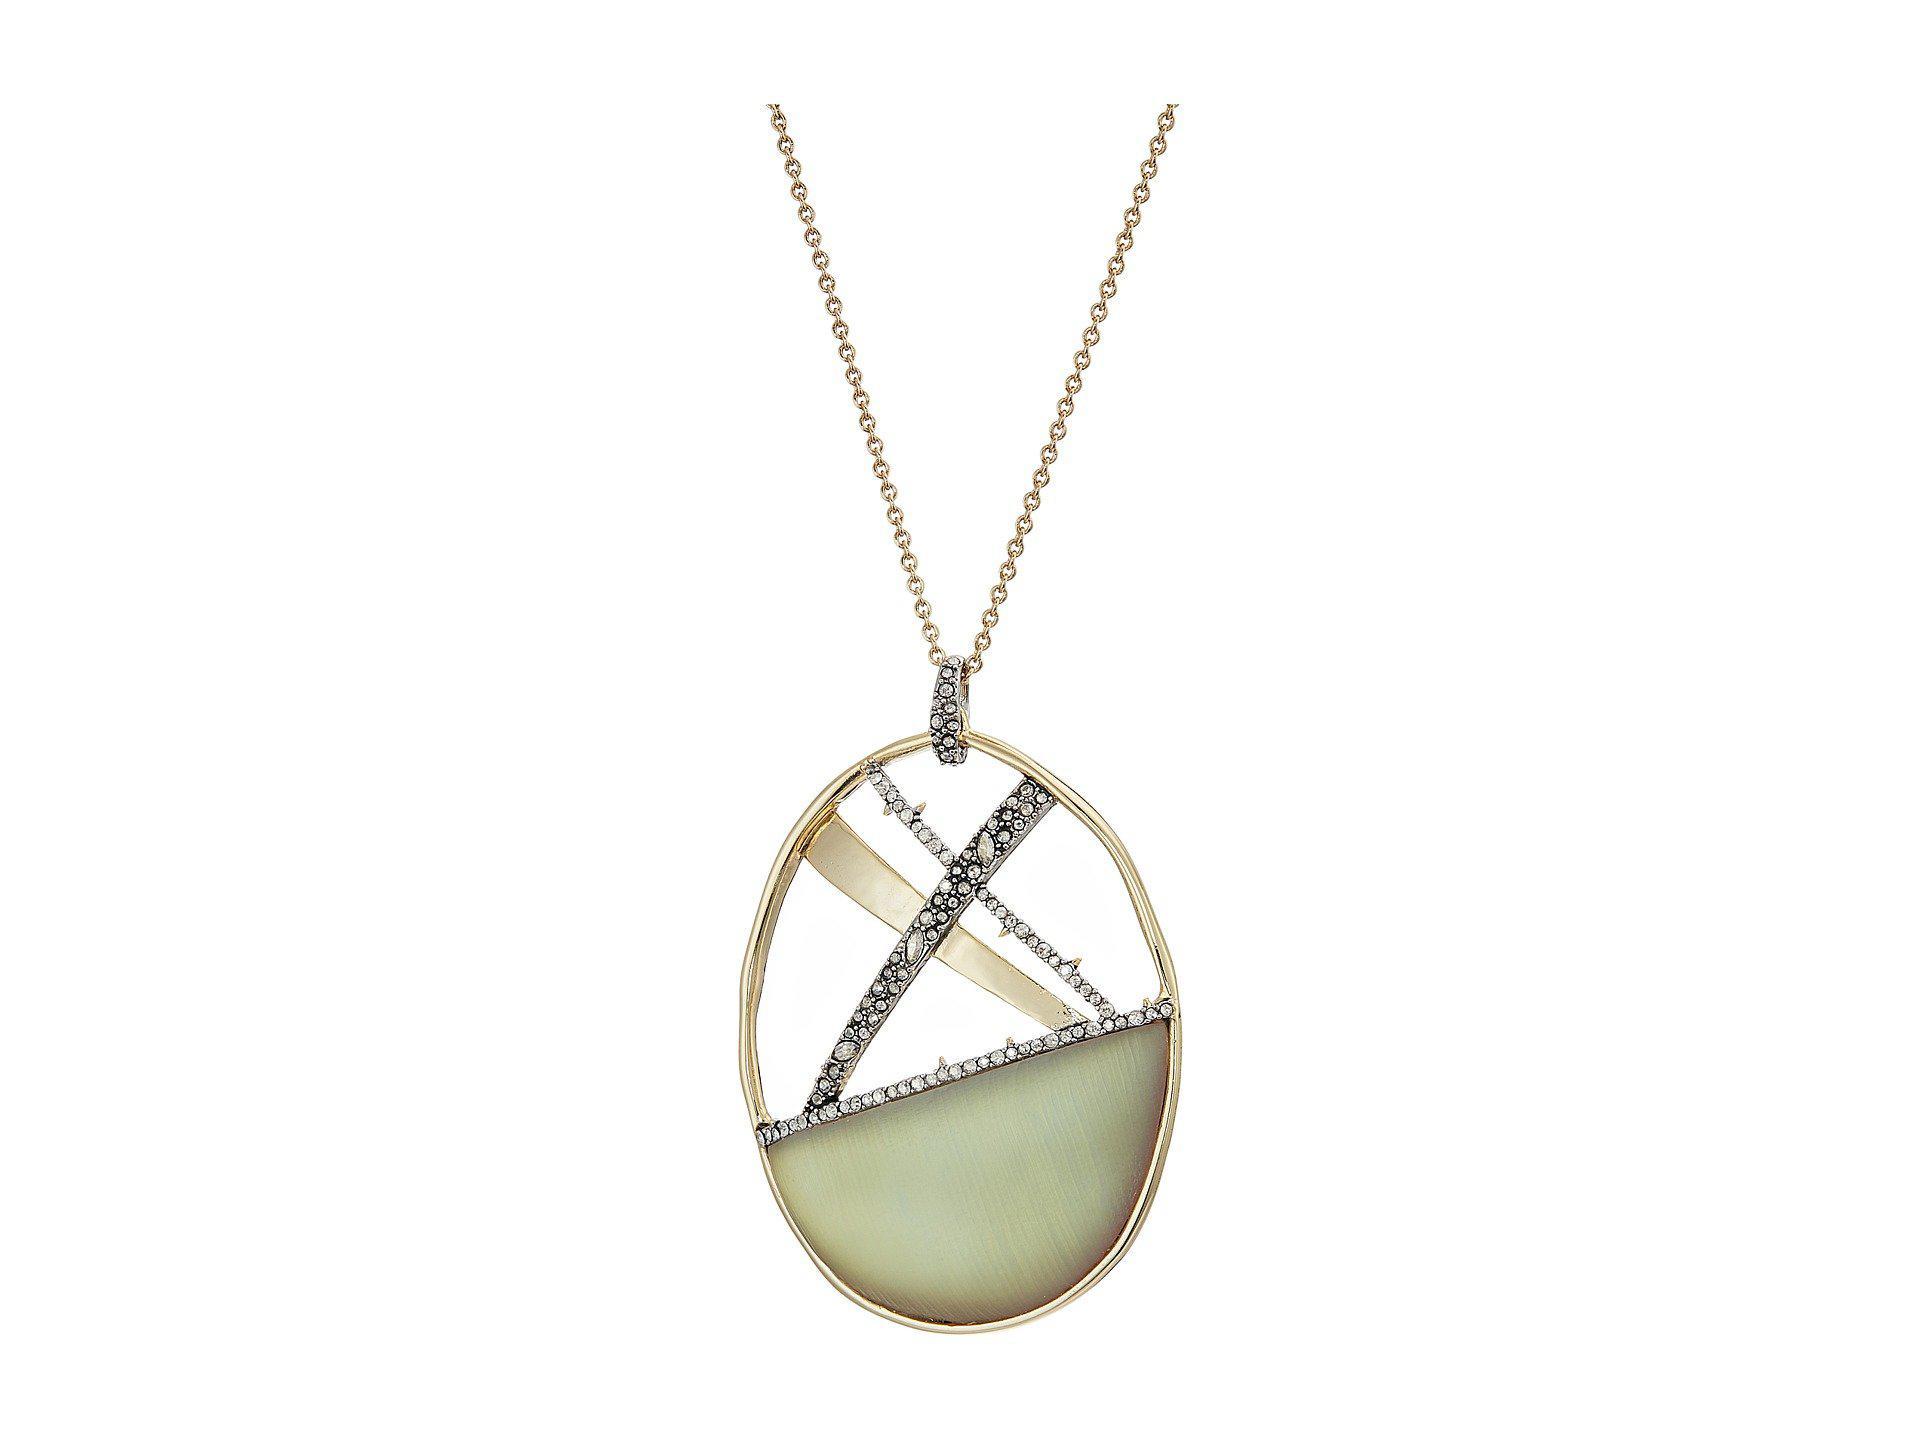 Alexis Bittar Crystal Encrusted Organic Link Tassel Bib Necklace New labradorite Qeq8HGuTbz